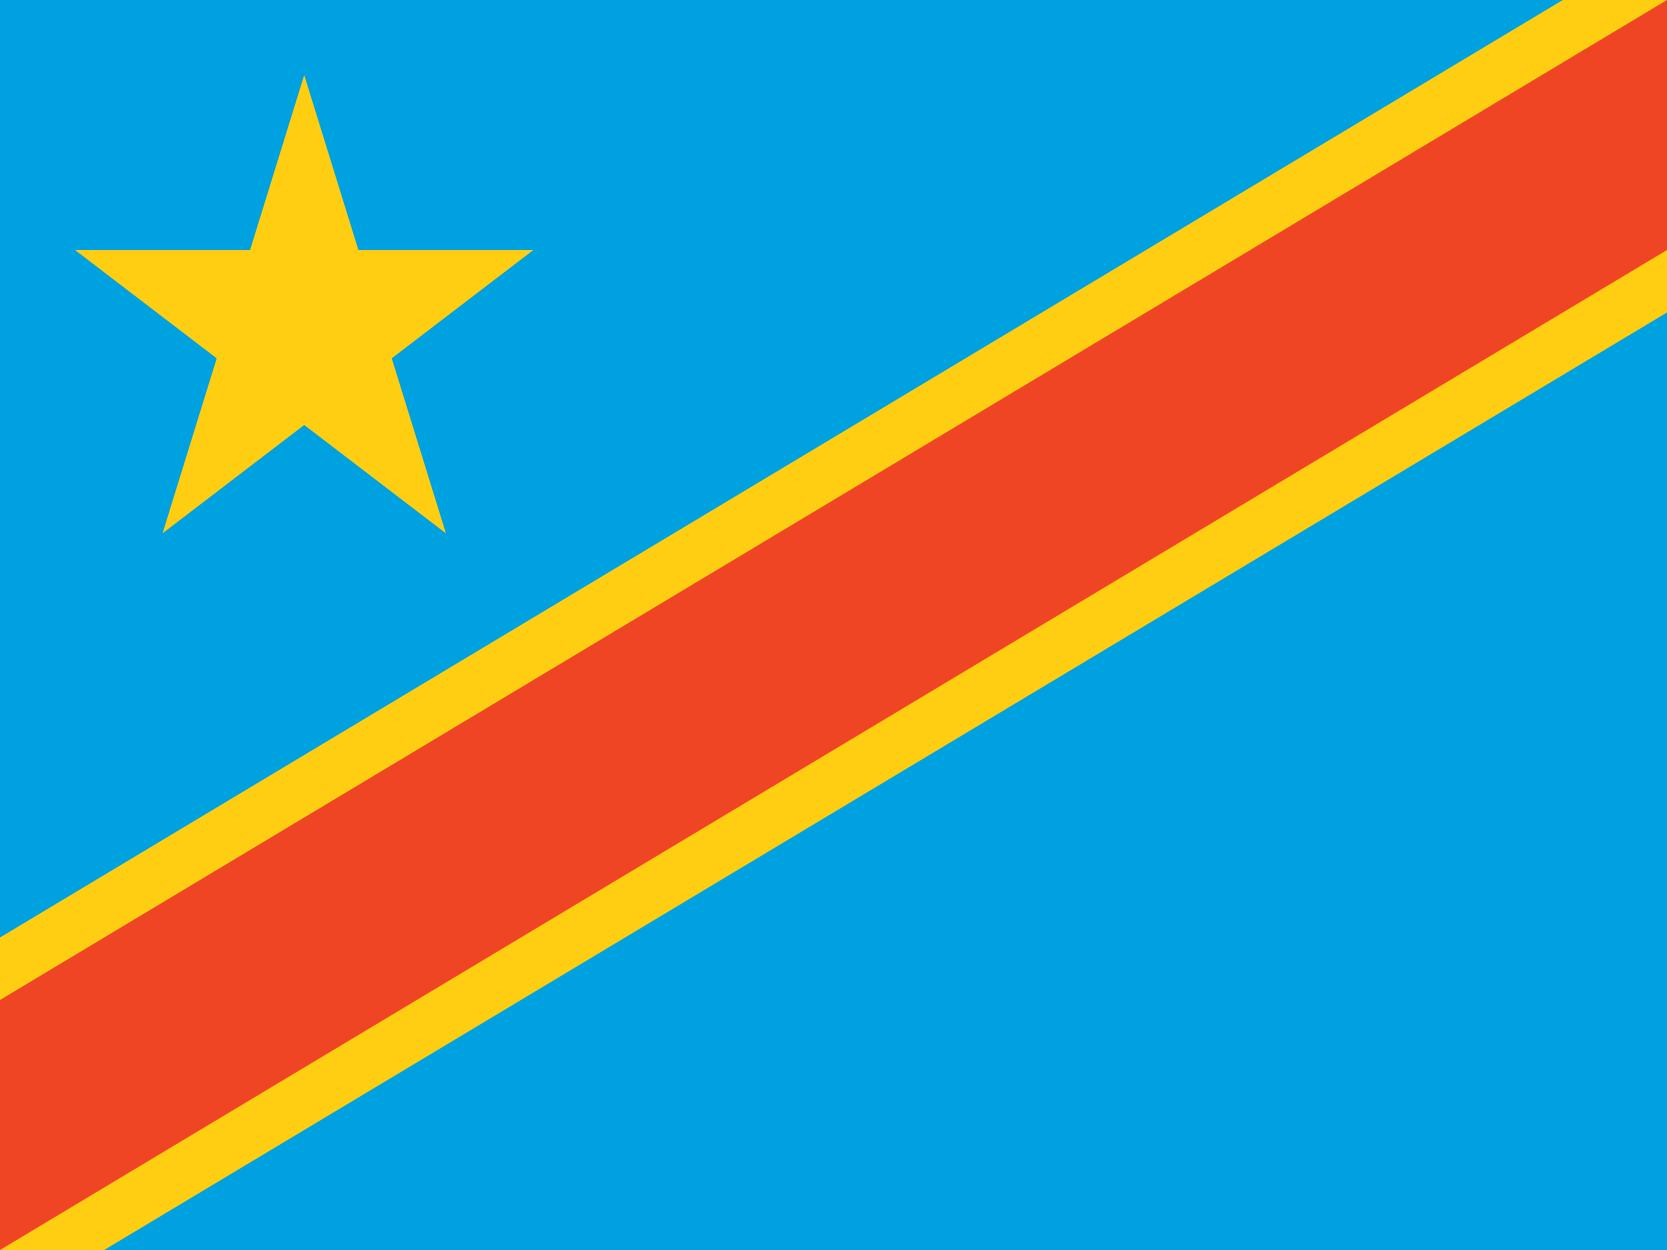 Democratic Republic of the Congo Flag and Emblem Vector EPS Free Download, Logo, Icons, Brand Em ...